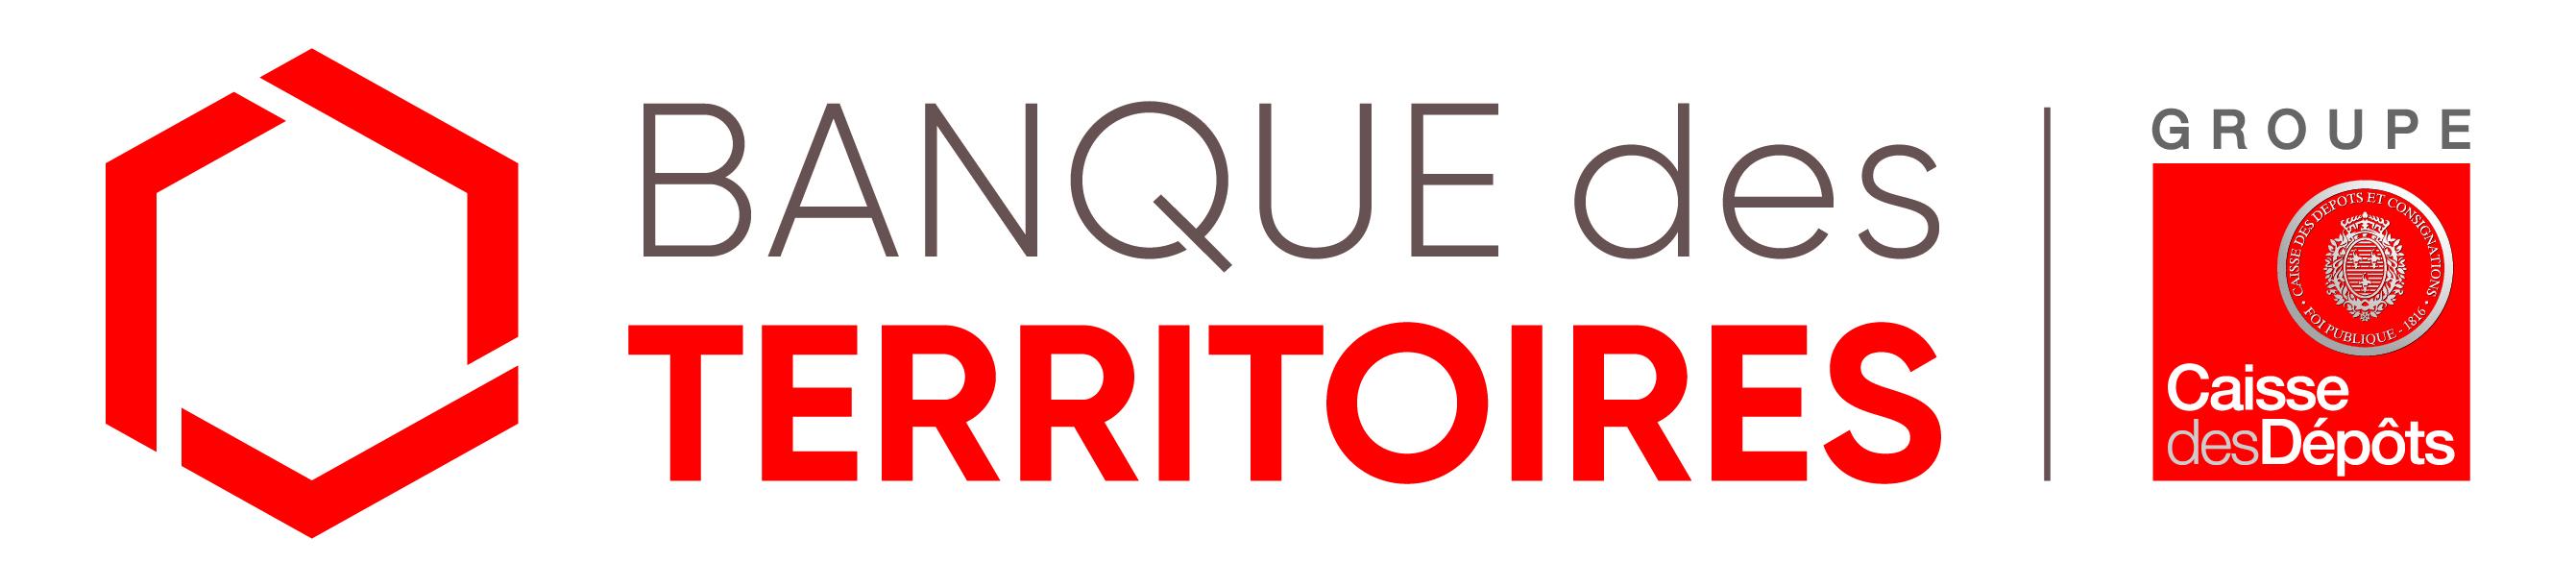 Logo_cdc_banque-territoire-2018.jpg